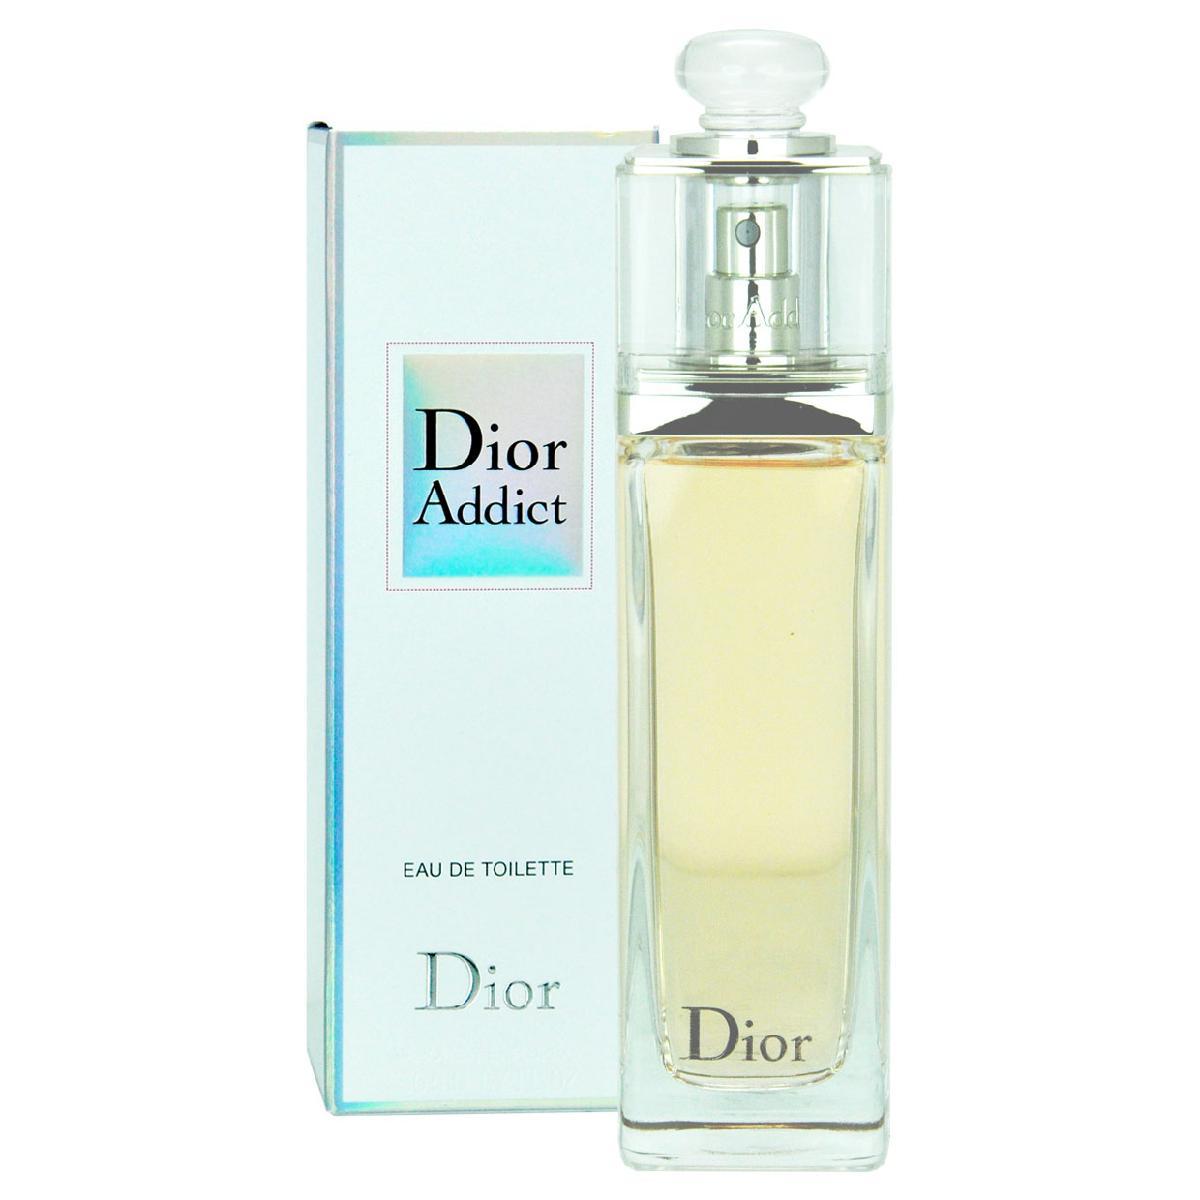 Dior Addict EDT spray 50ml - [Parallel Import Product]